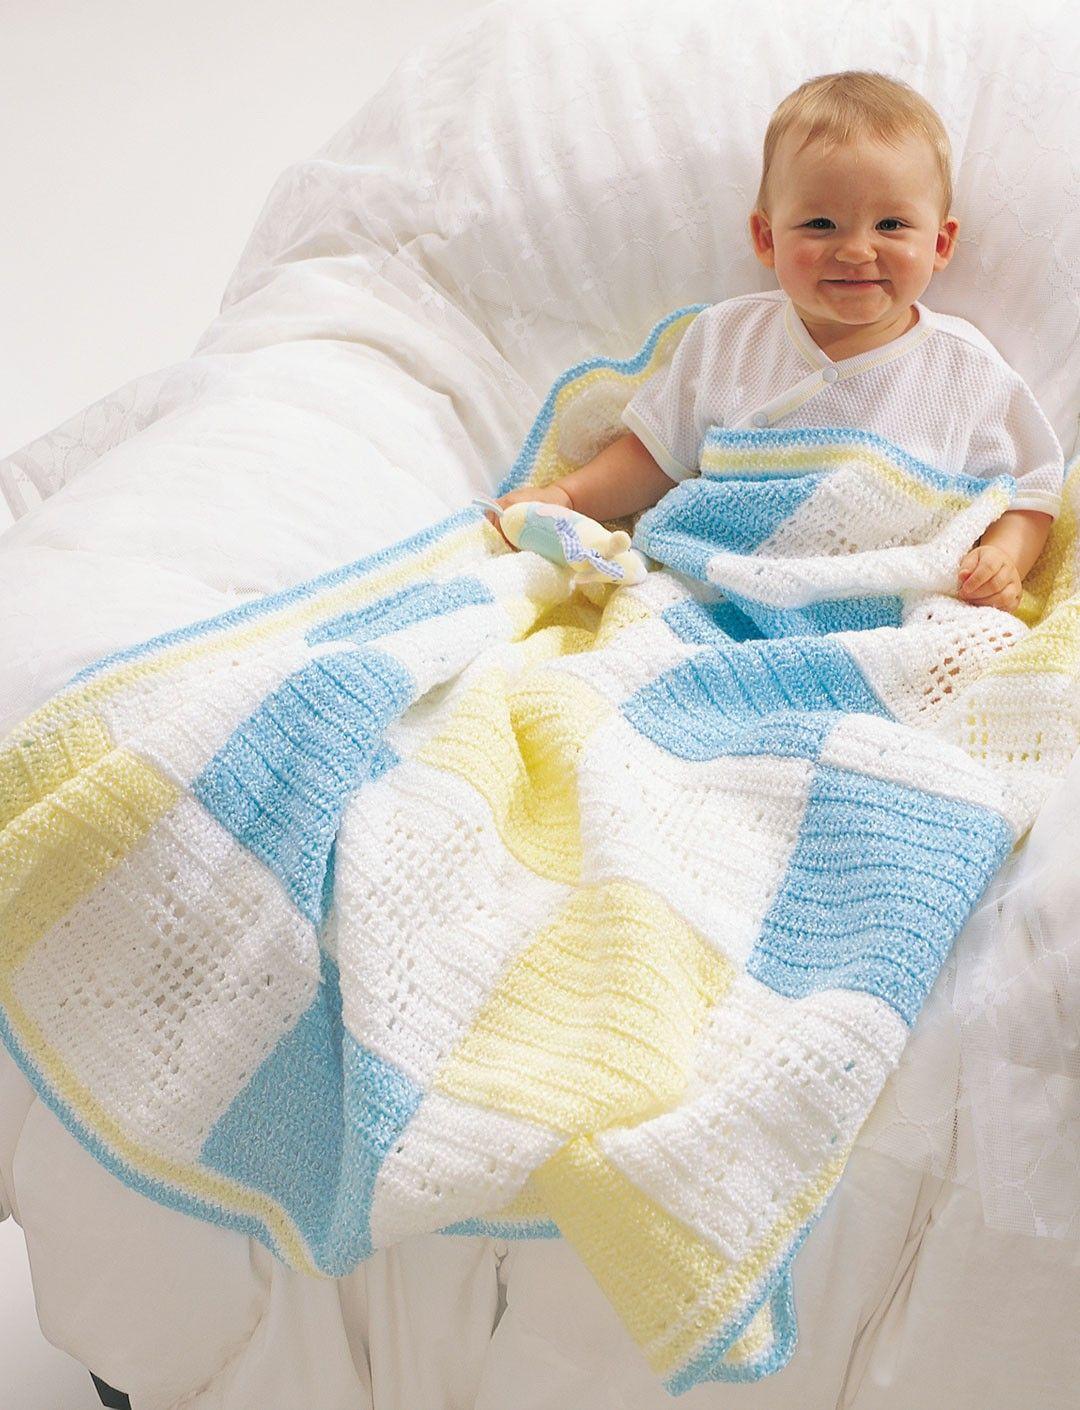 Yarnspirations.com - Bernat Twinkle Little Star Blanket | Free ...